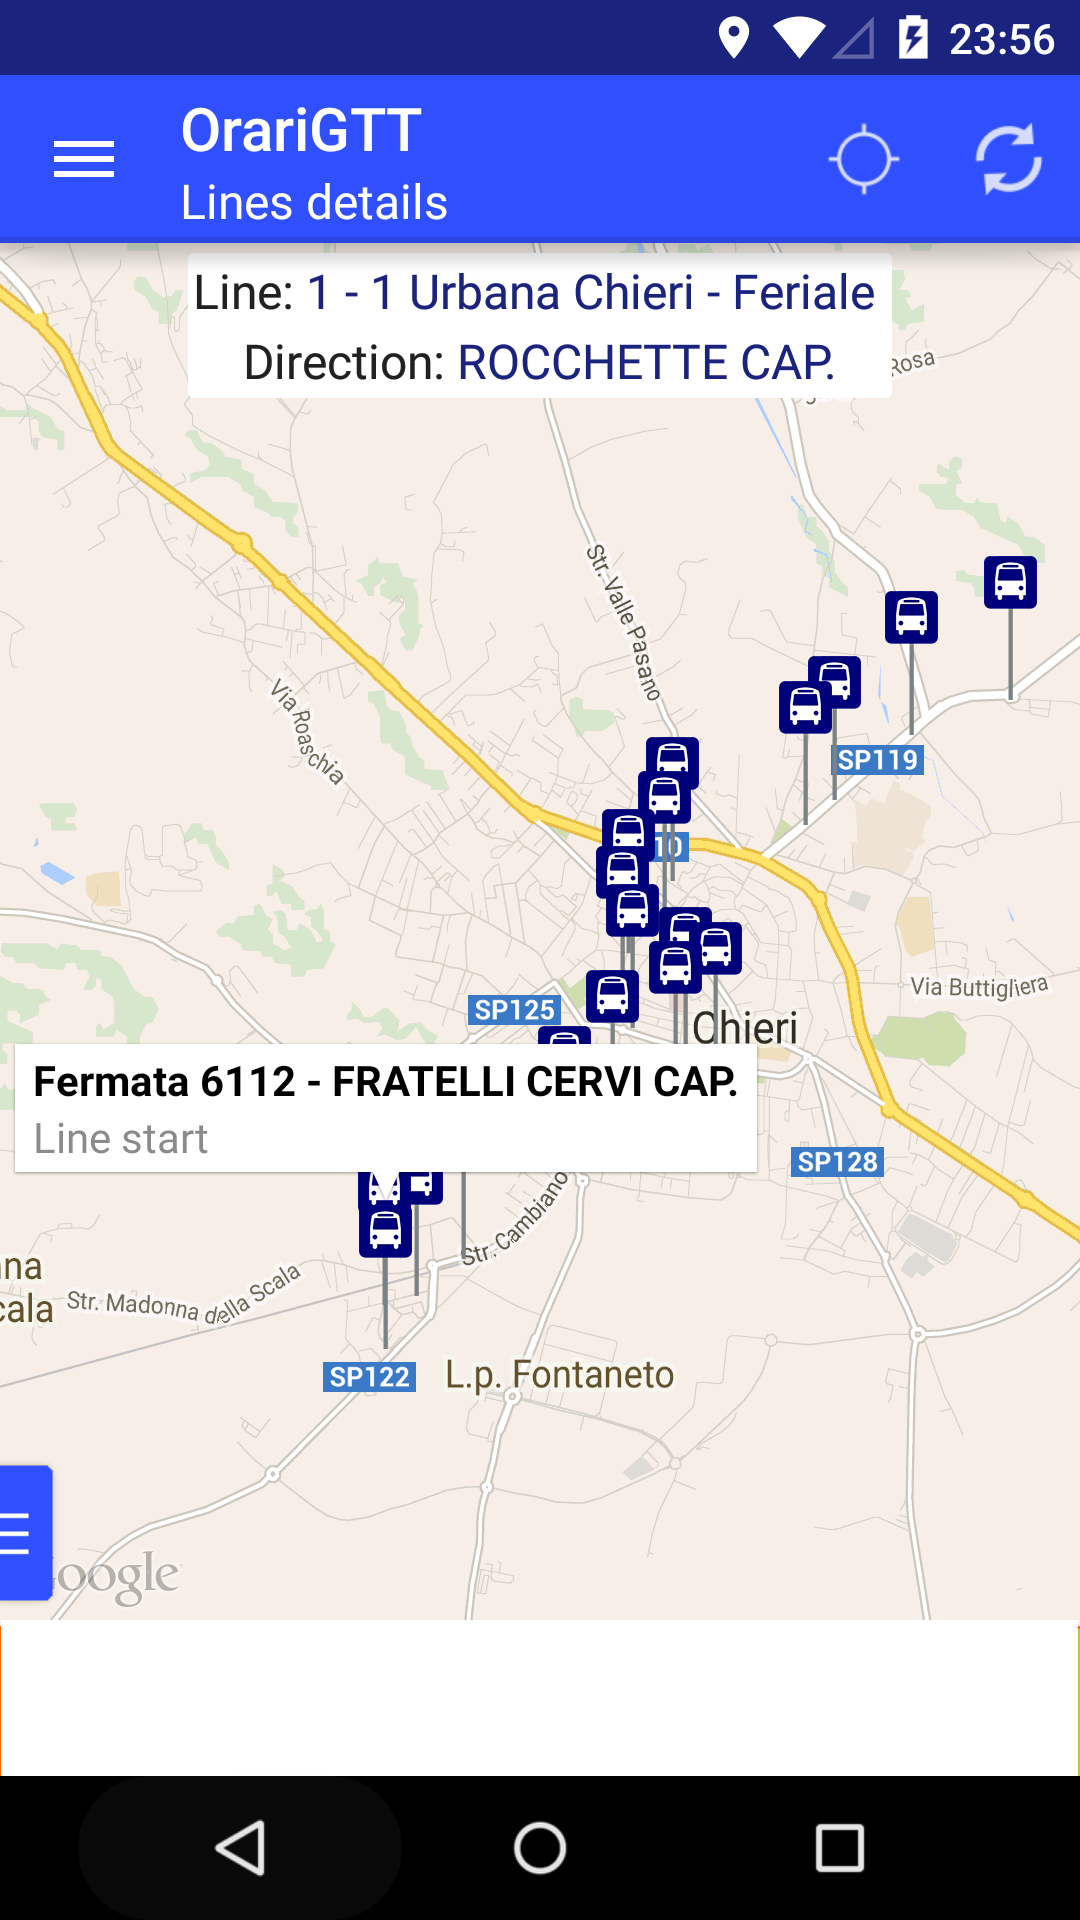 Orari GTT - Turin Transport: Amazon.de: Apps für Android